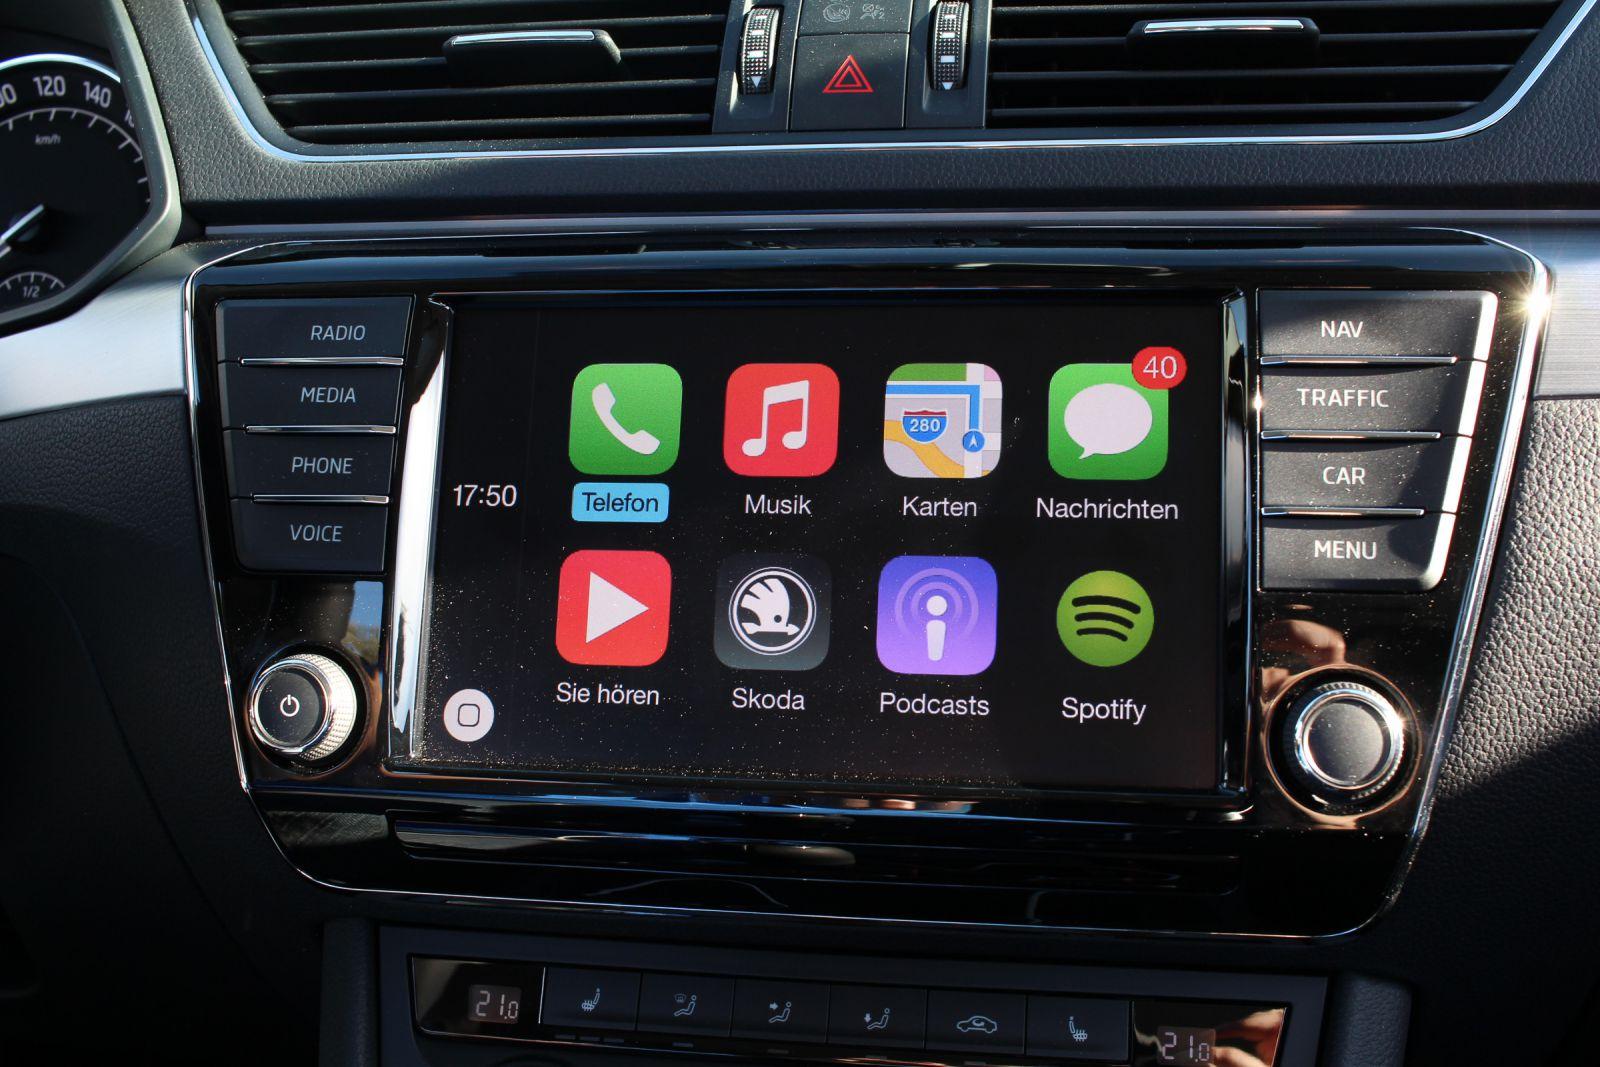 Apple-CarPlay-Skoda-Superb-Jens-Stratmann-6